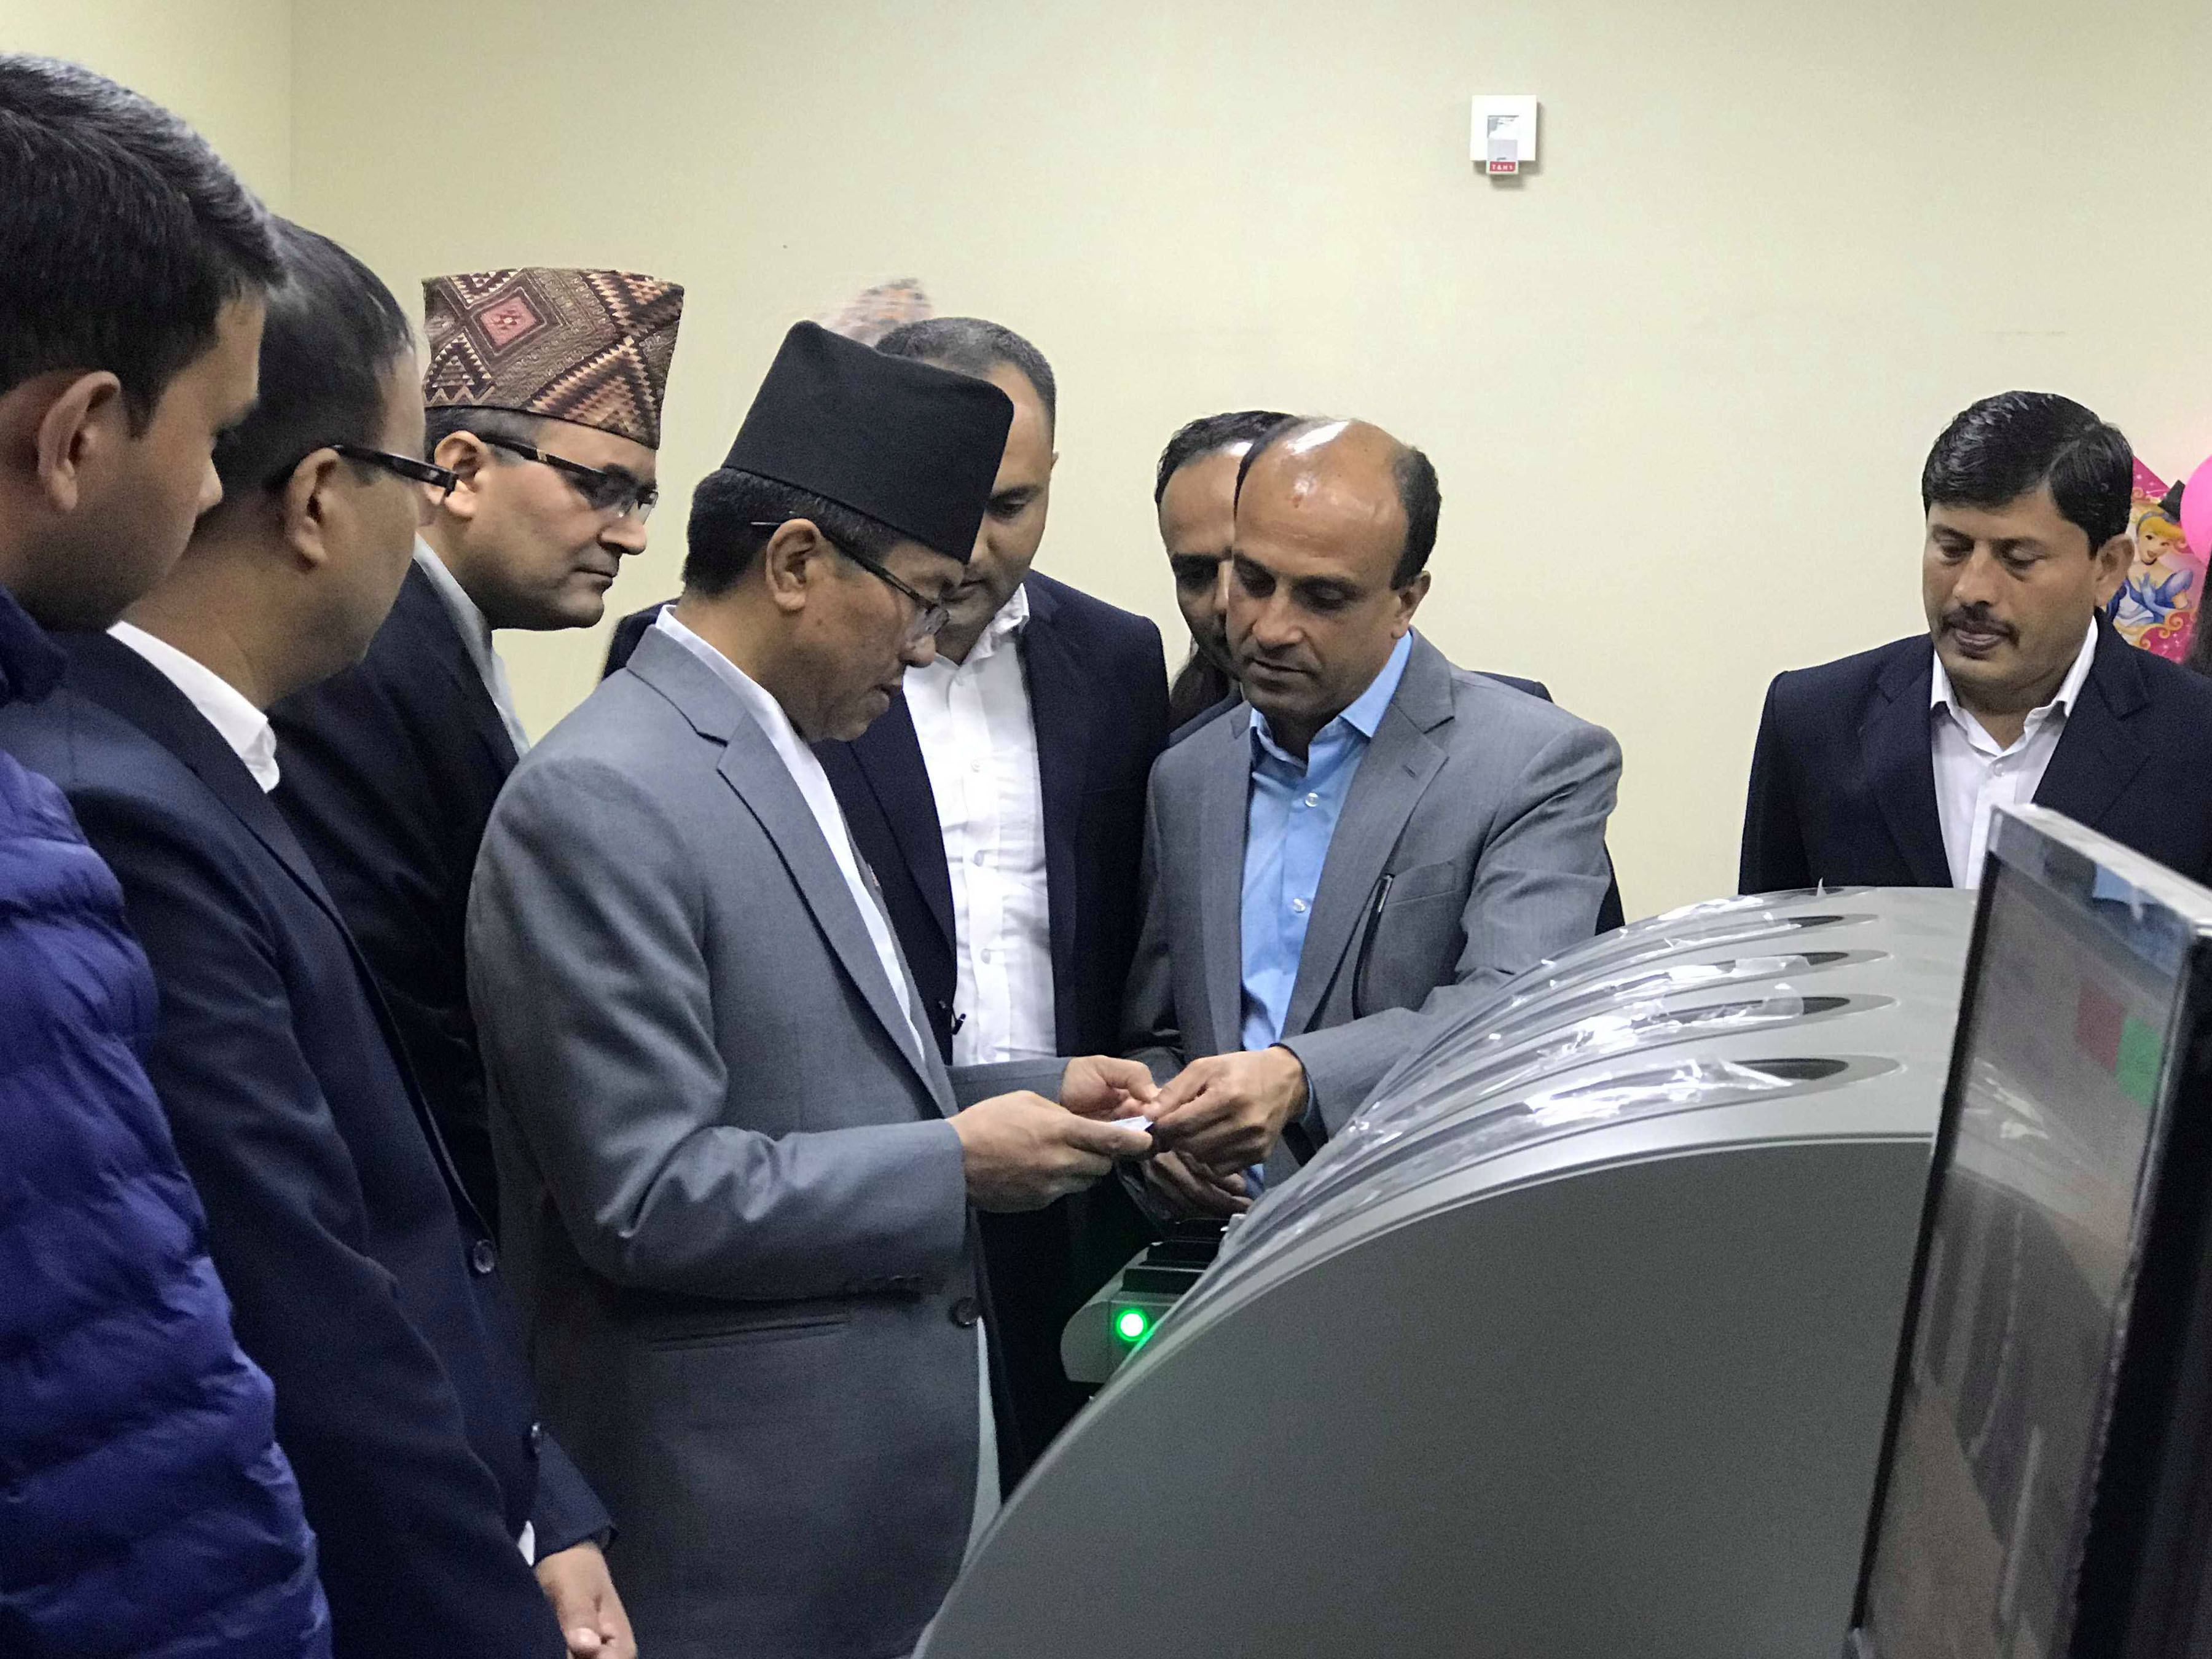 Home Secretary Prem Rai initiates printing of national identity cards at Singha Durbar, in Kathmandu, on Thursday, November 1, 2018. Photo: RSS